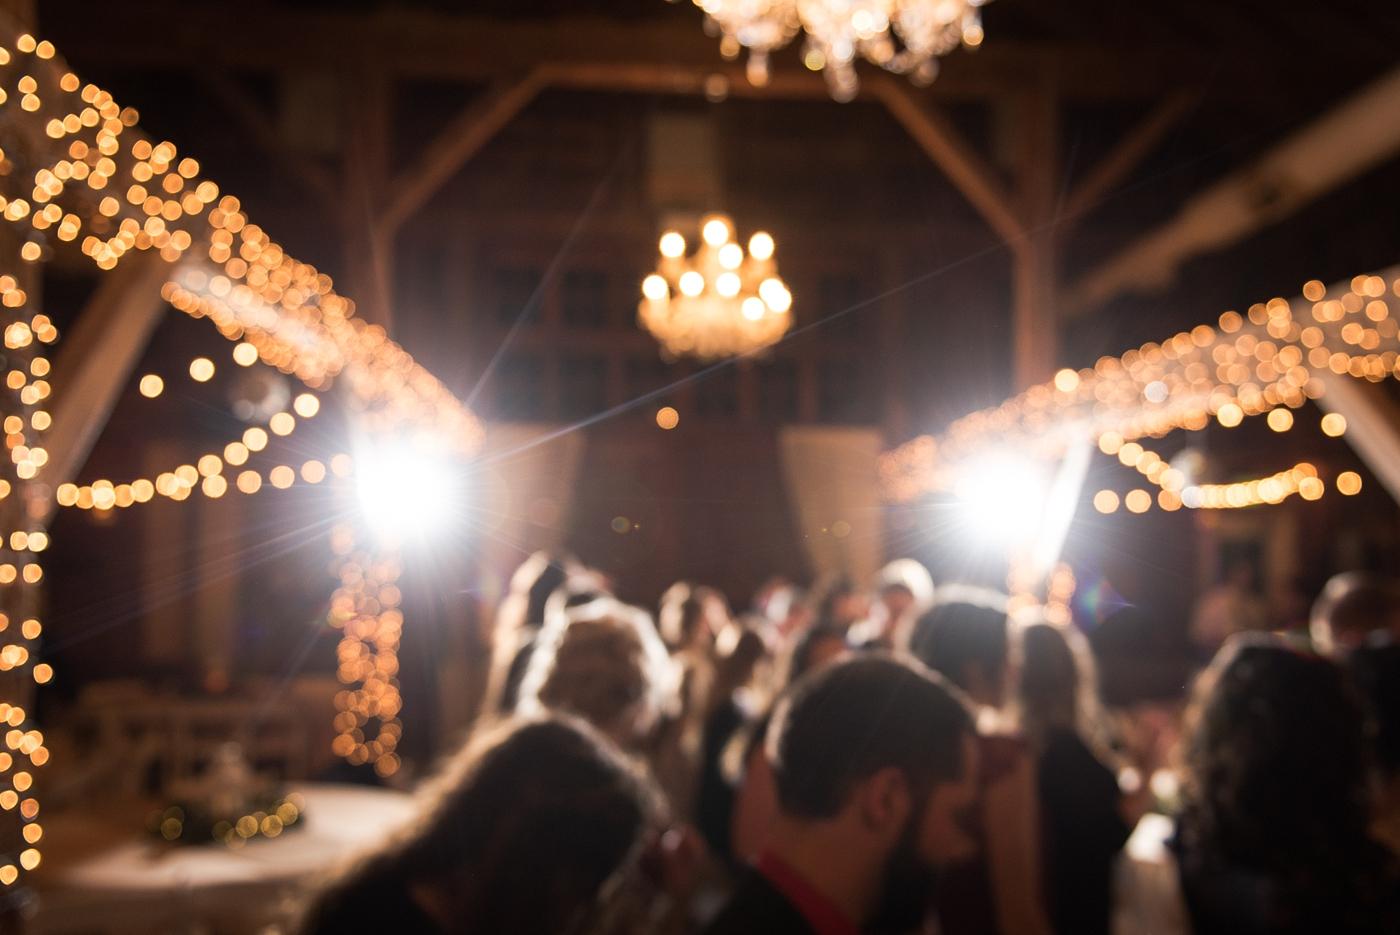 indianapolis-top-rated-wedding-photographers_0476.jpg